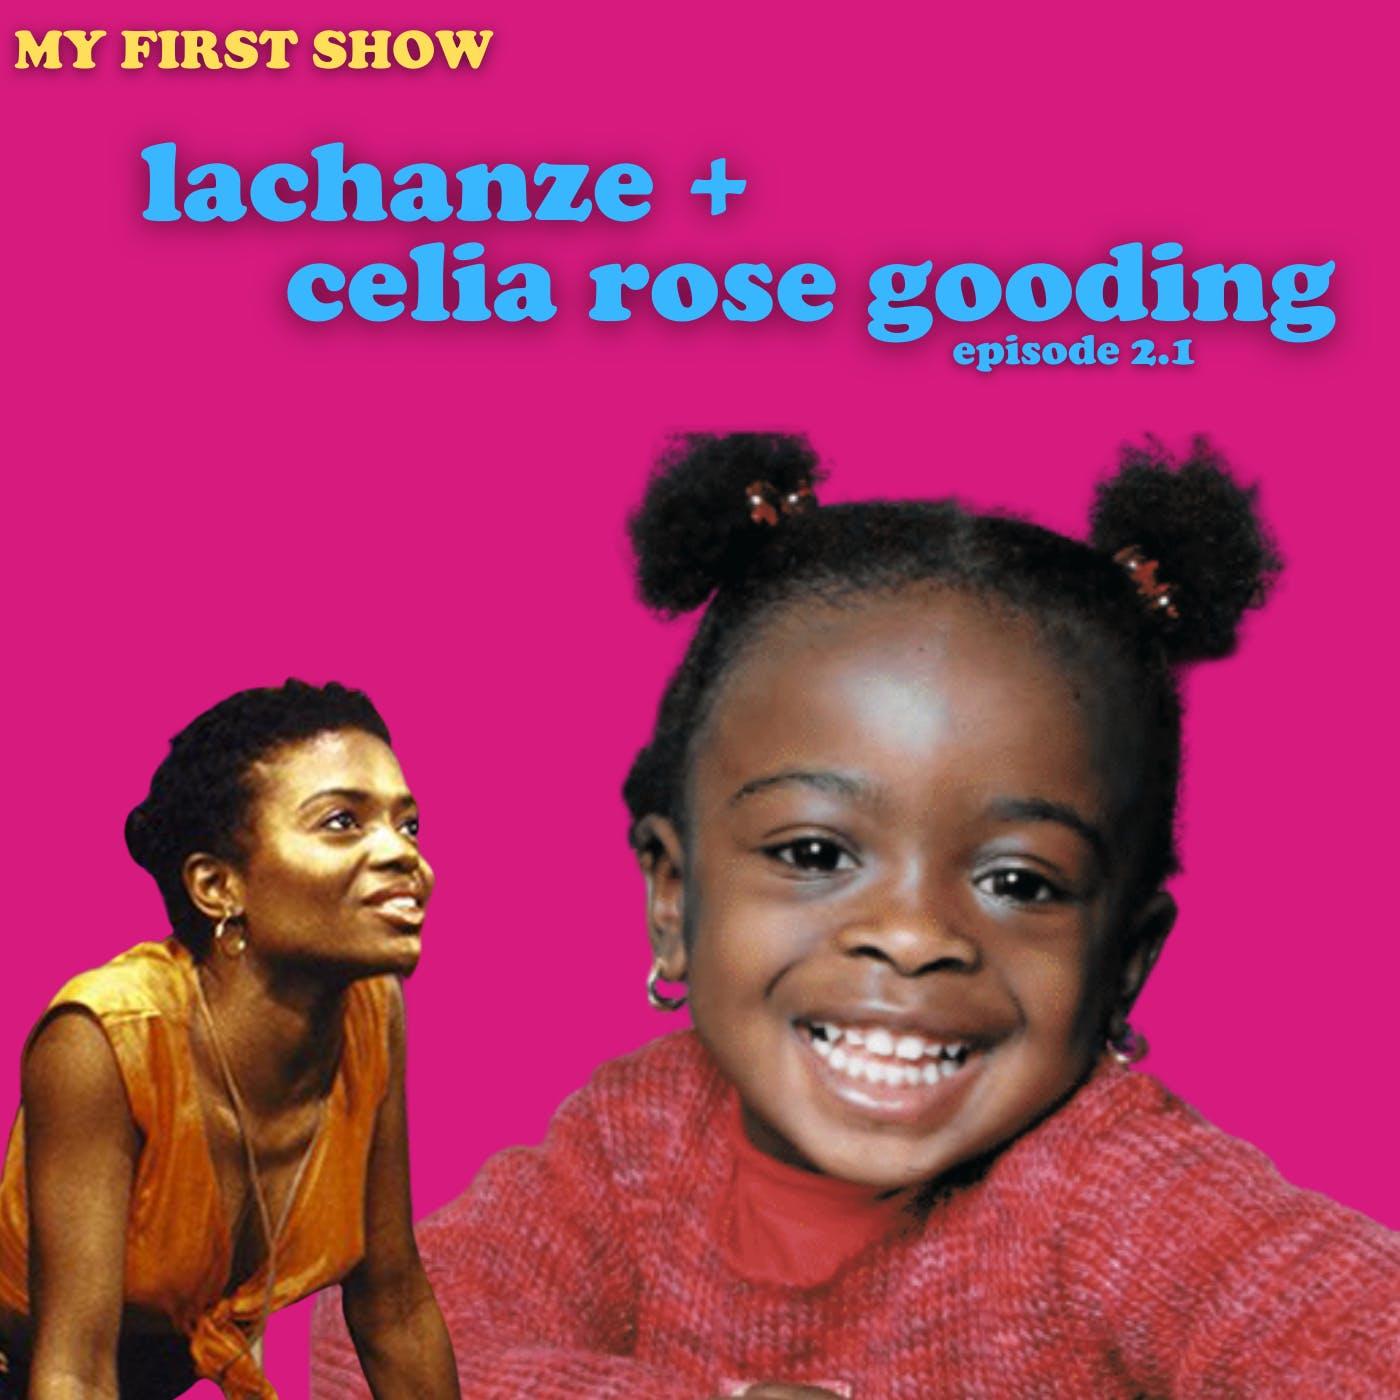 S2/Ep1: LaChanze & Celia Rose Gooding